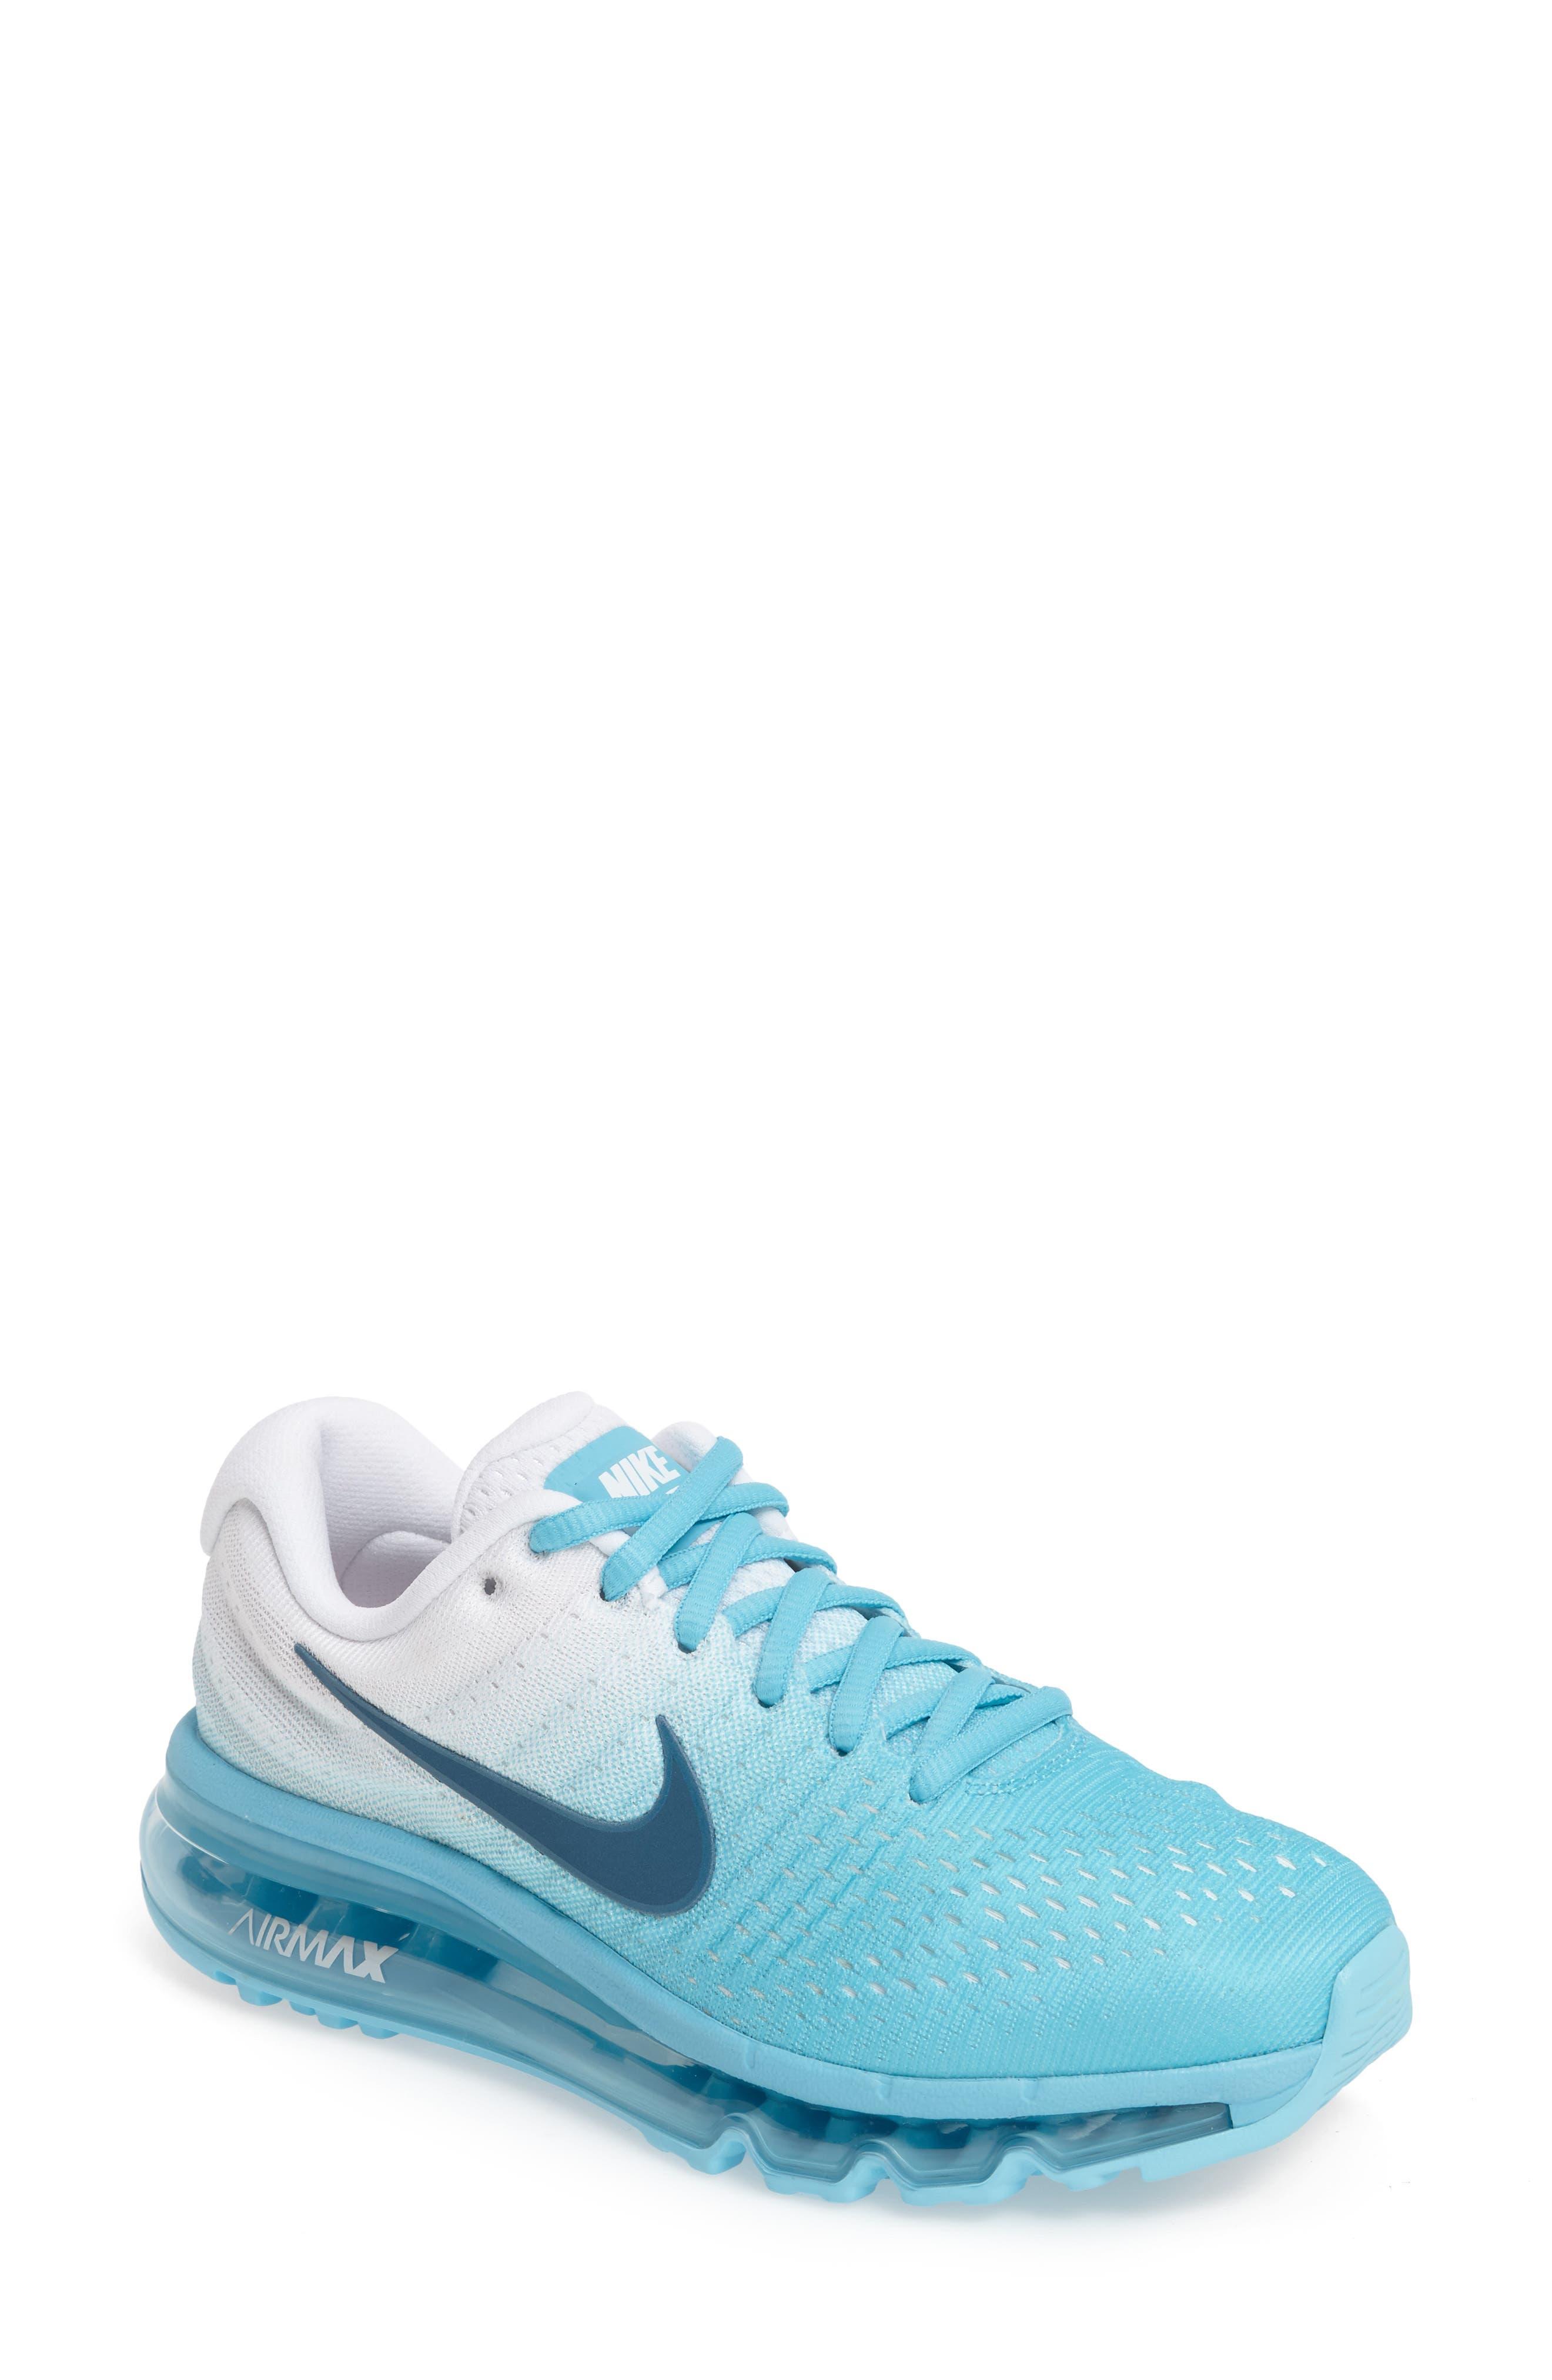 Alternate Image 1 Selected - Nike Air Max 2017 Running Shoe (Women)